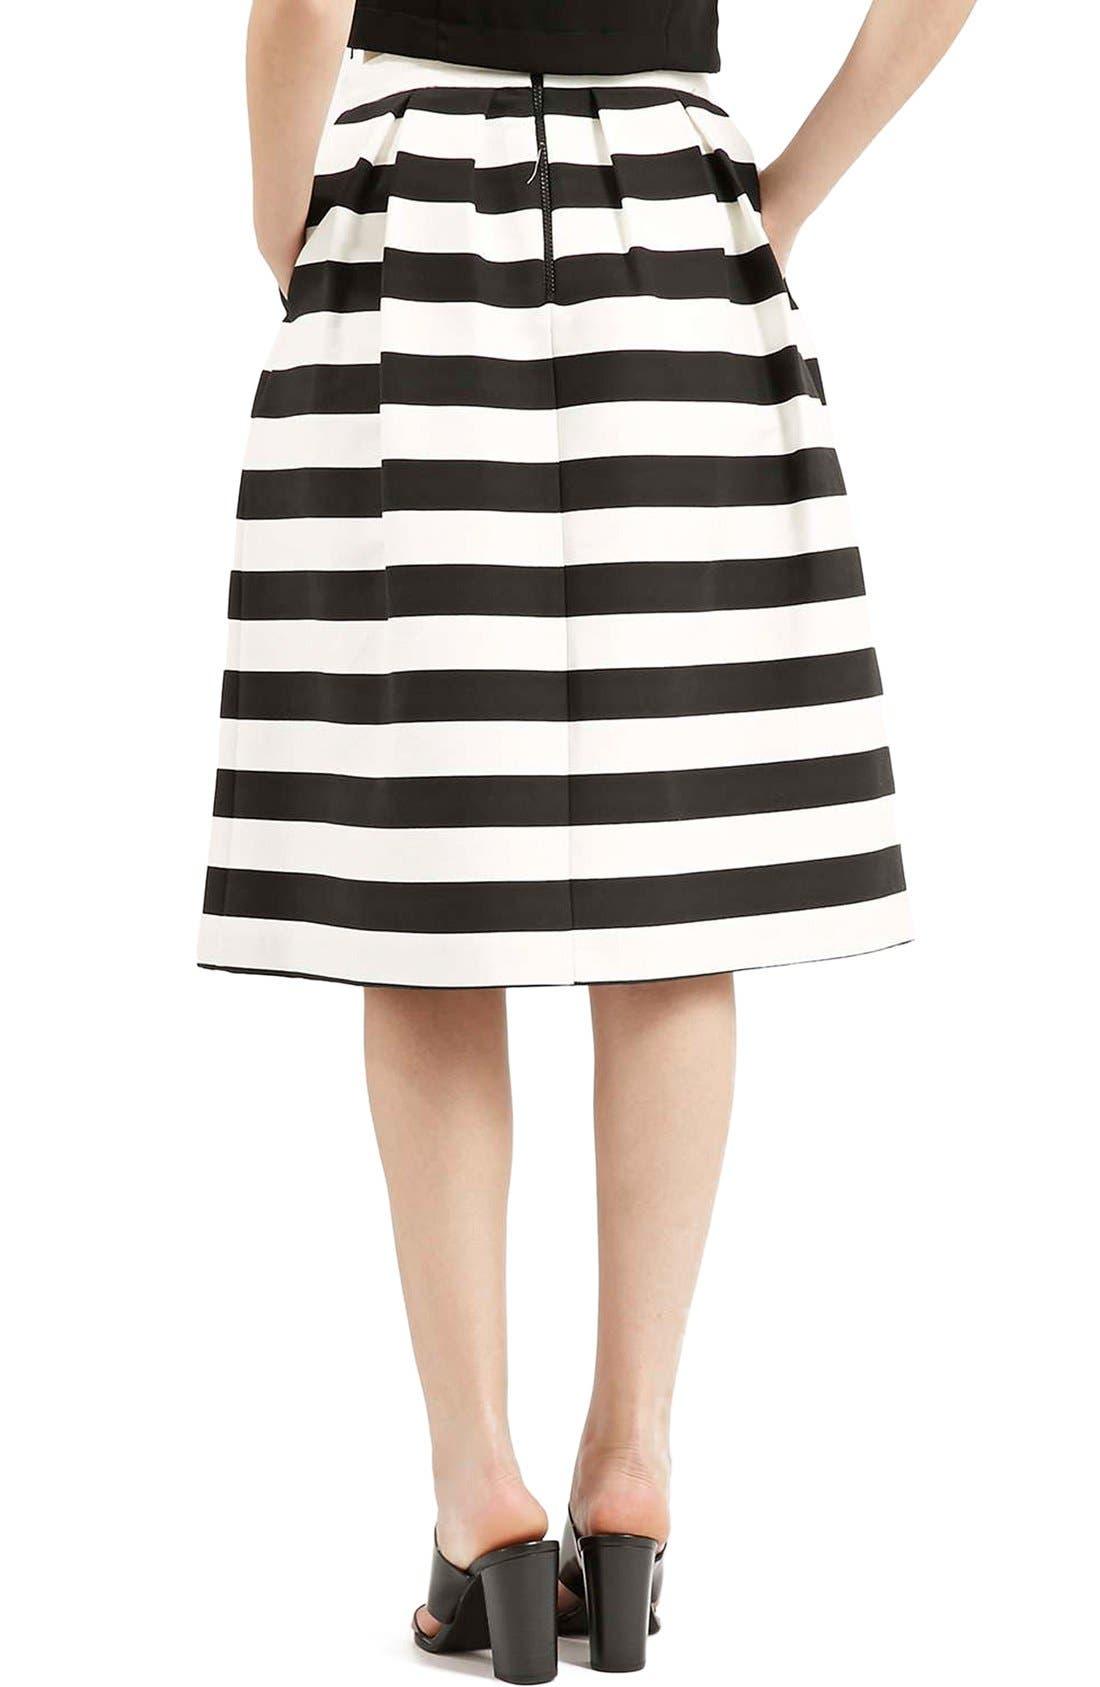 TOPSHOP, Stripe Midi Skirt, Alternate thumbnail 2, color, 001